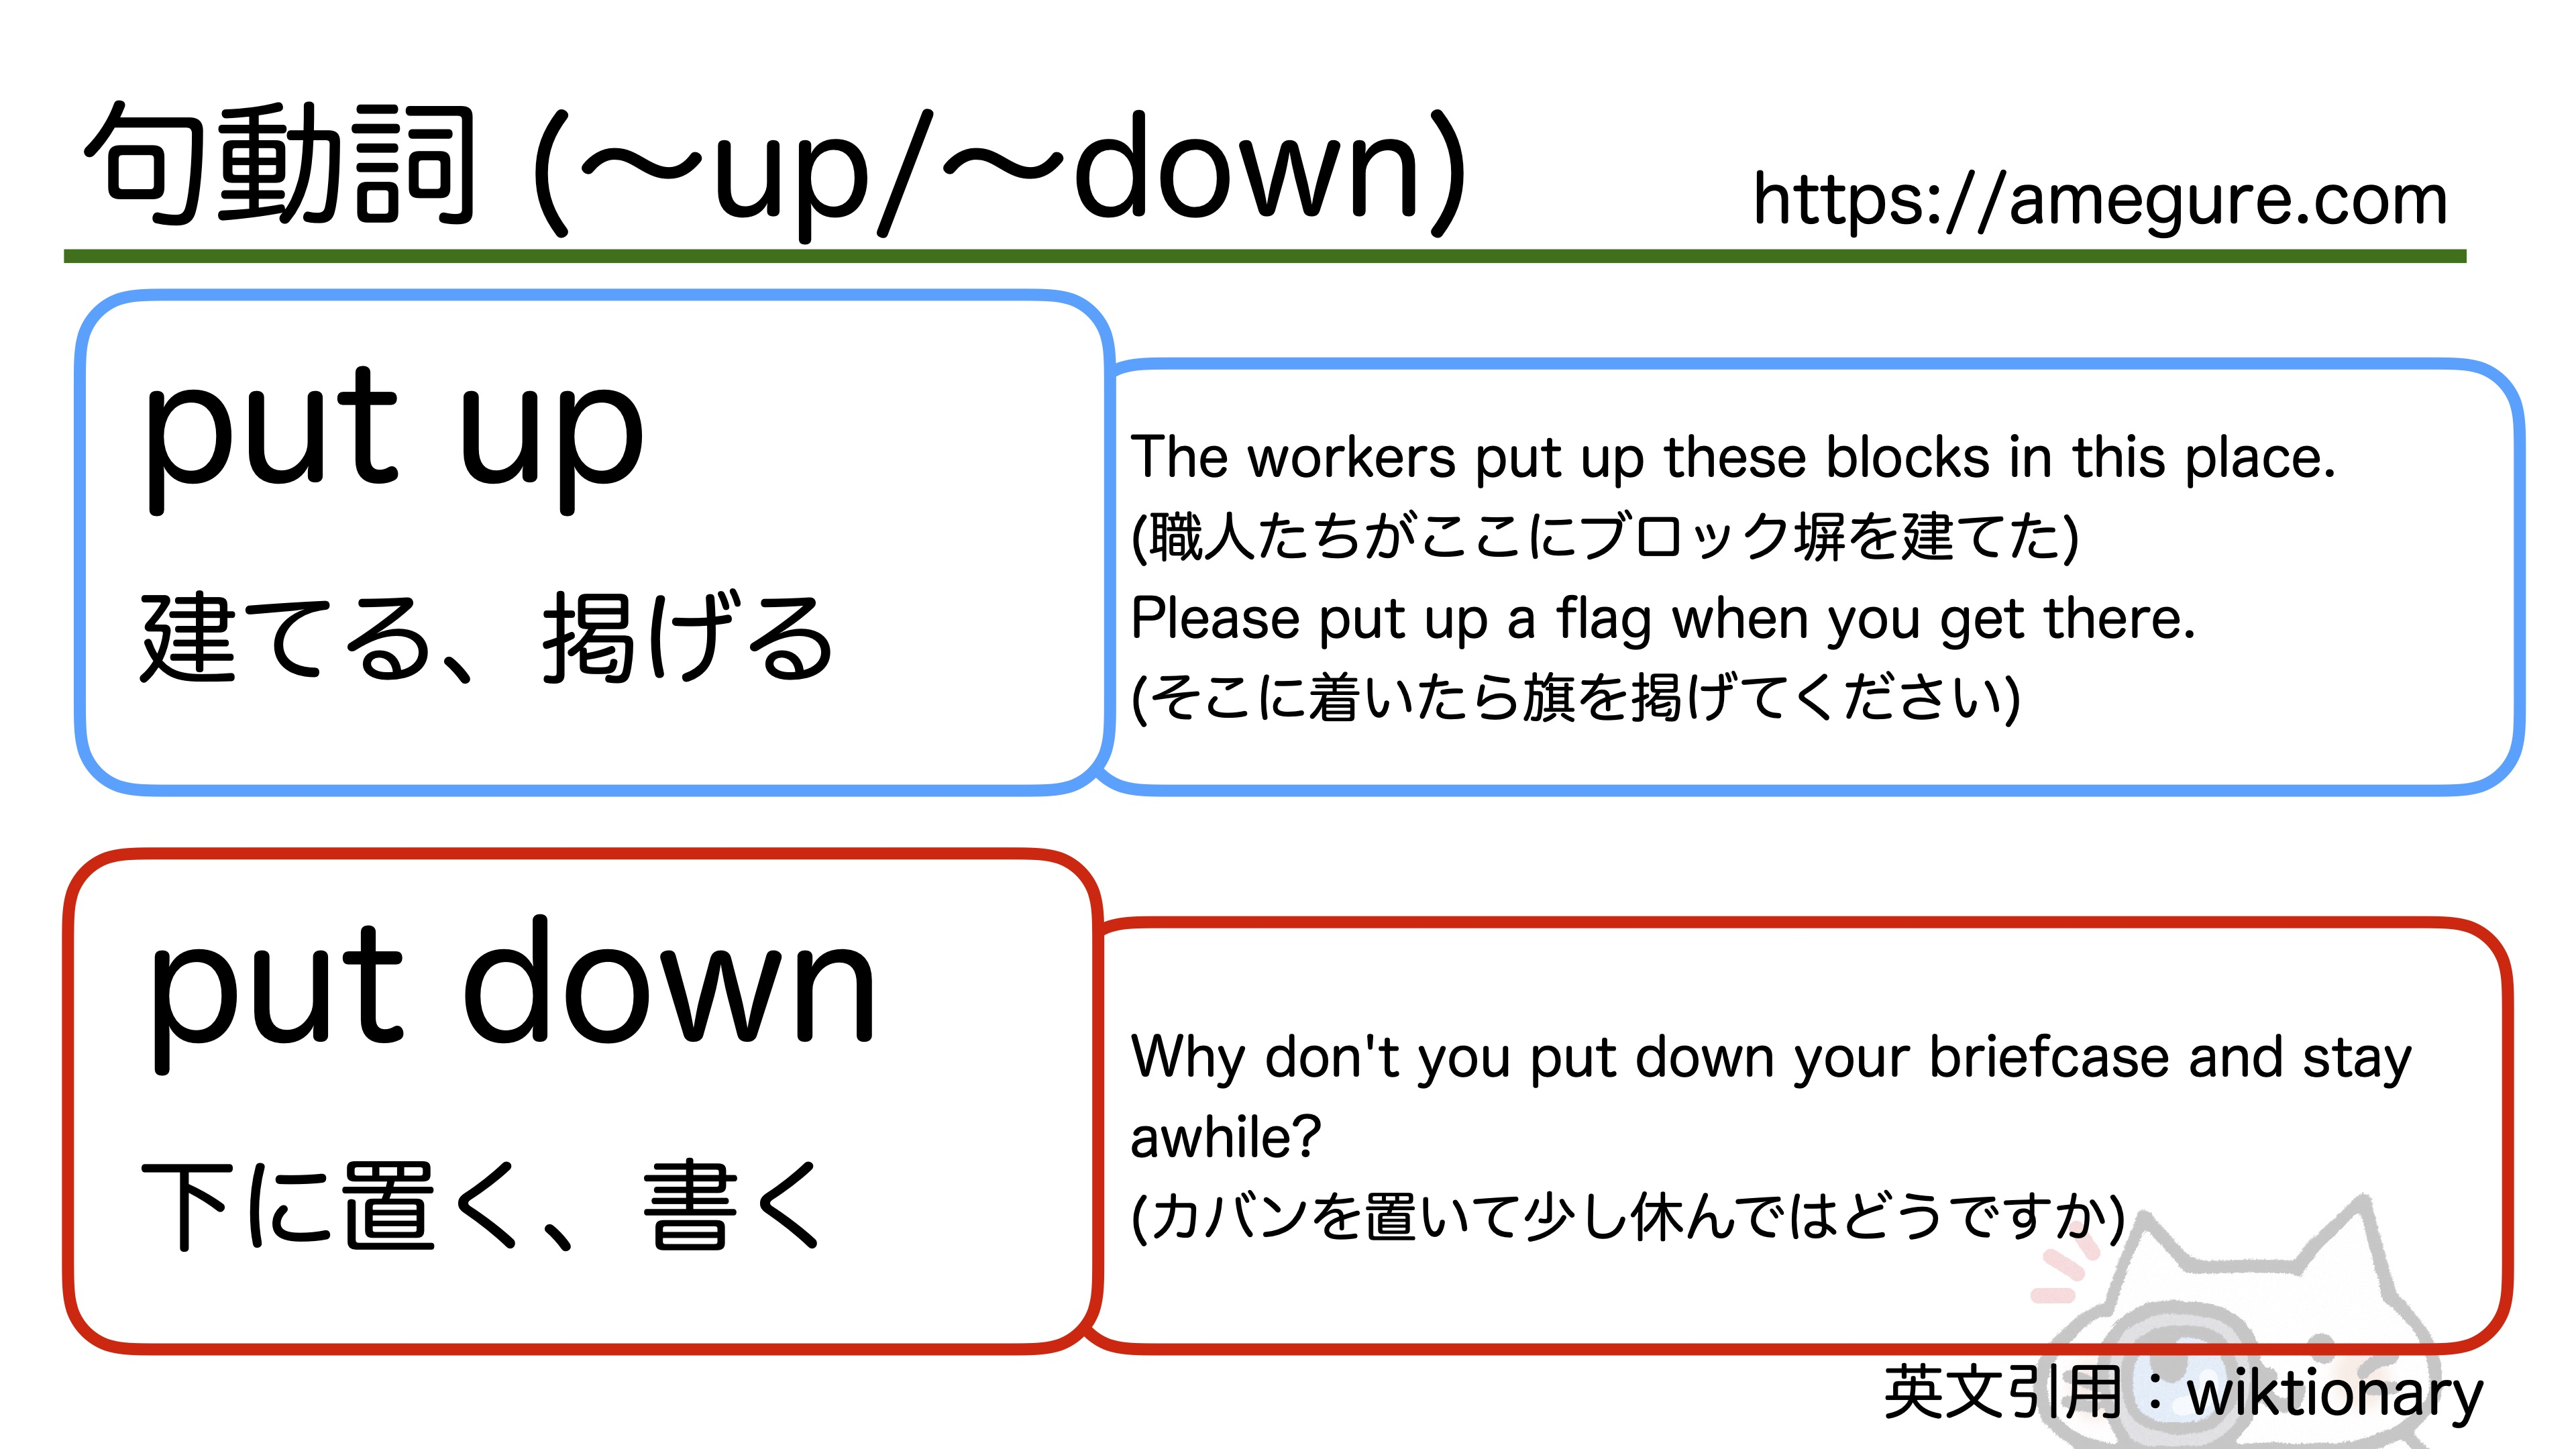 putup-putdown